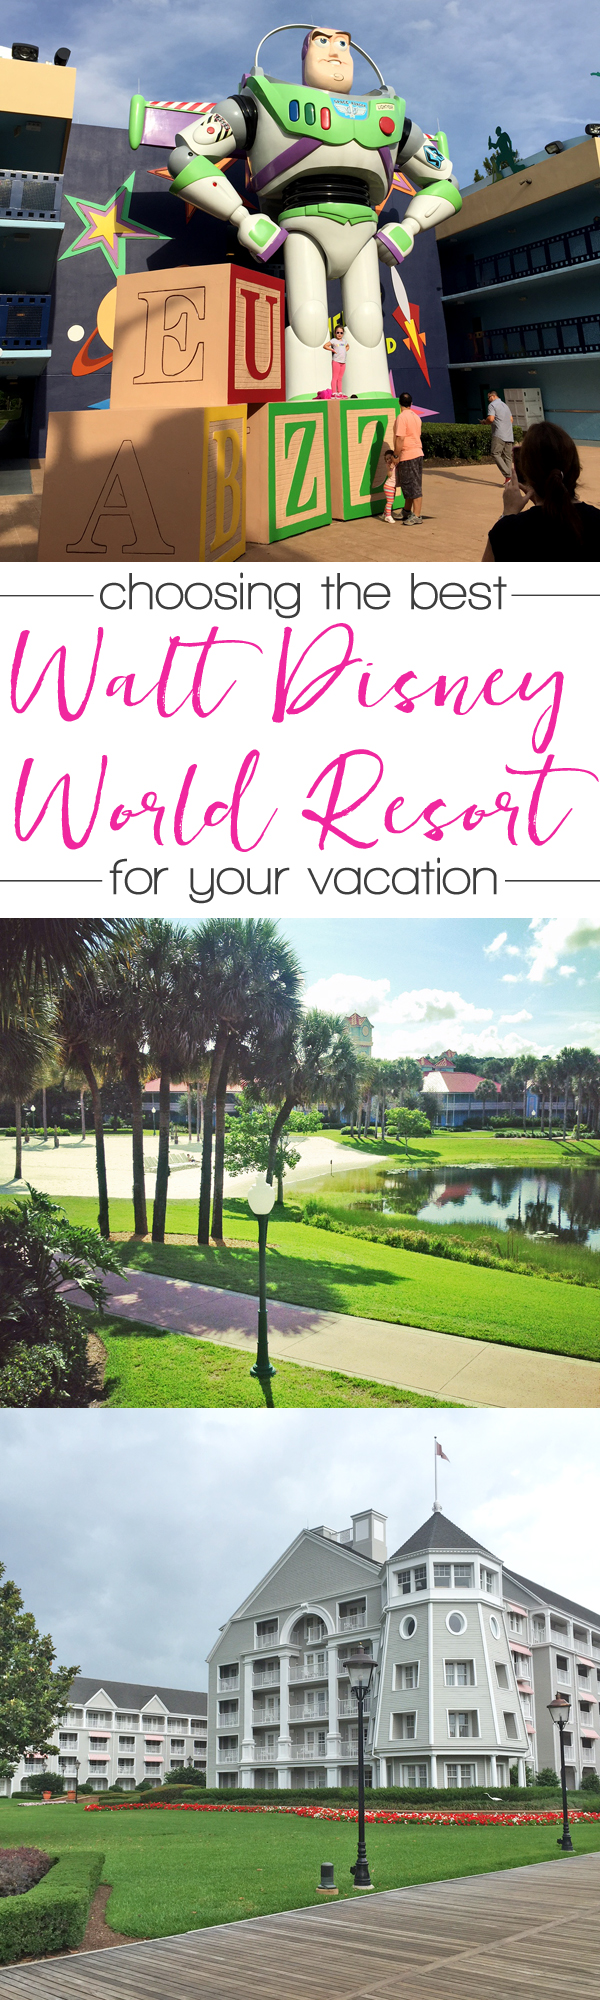 Disney World Resorts Tips